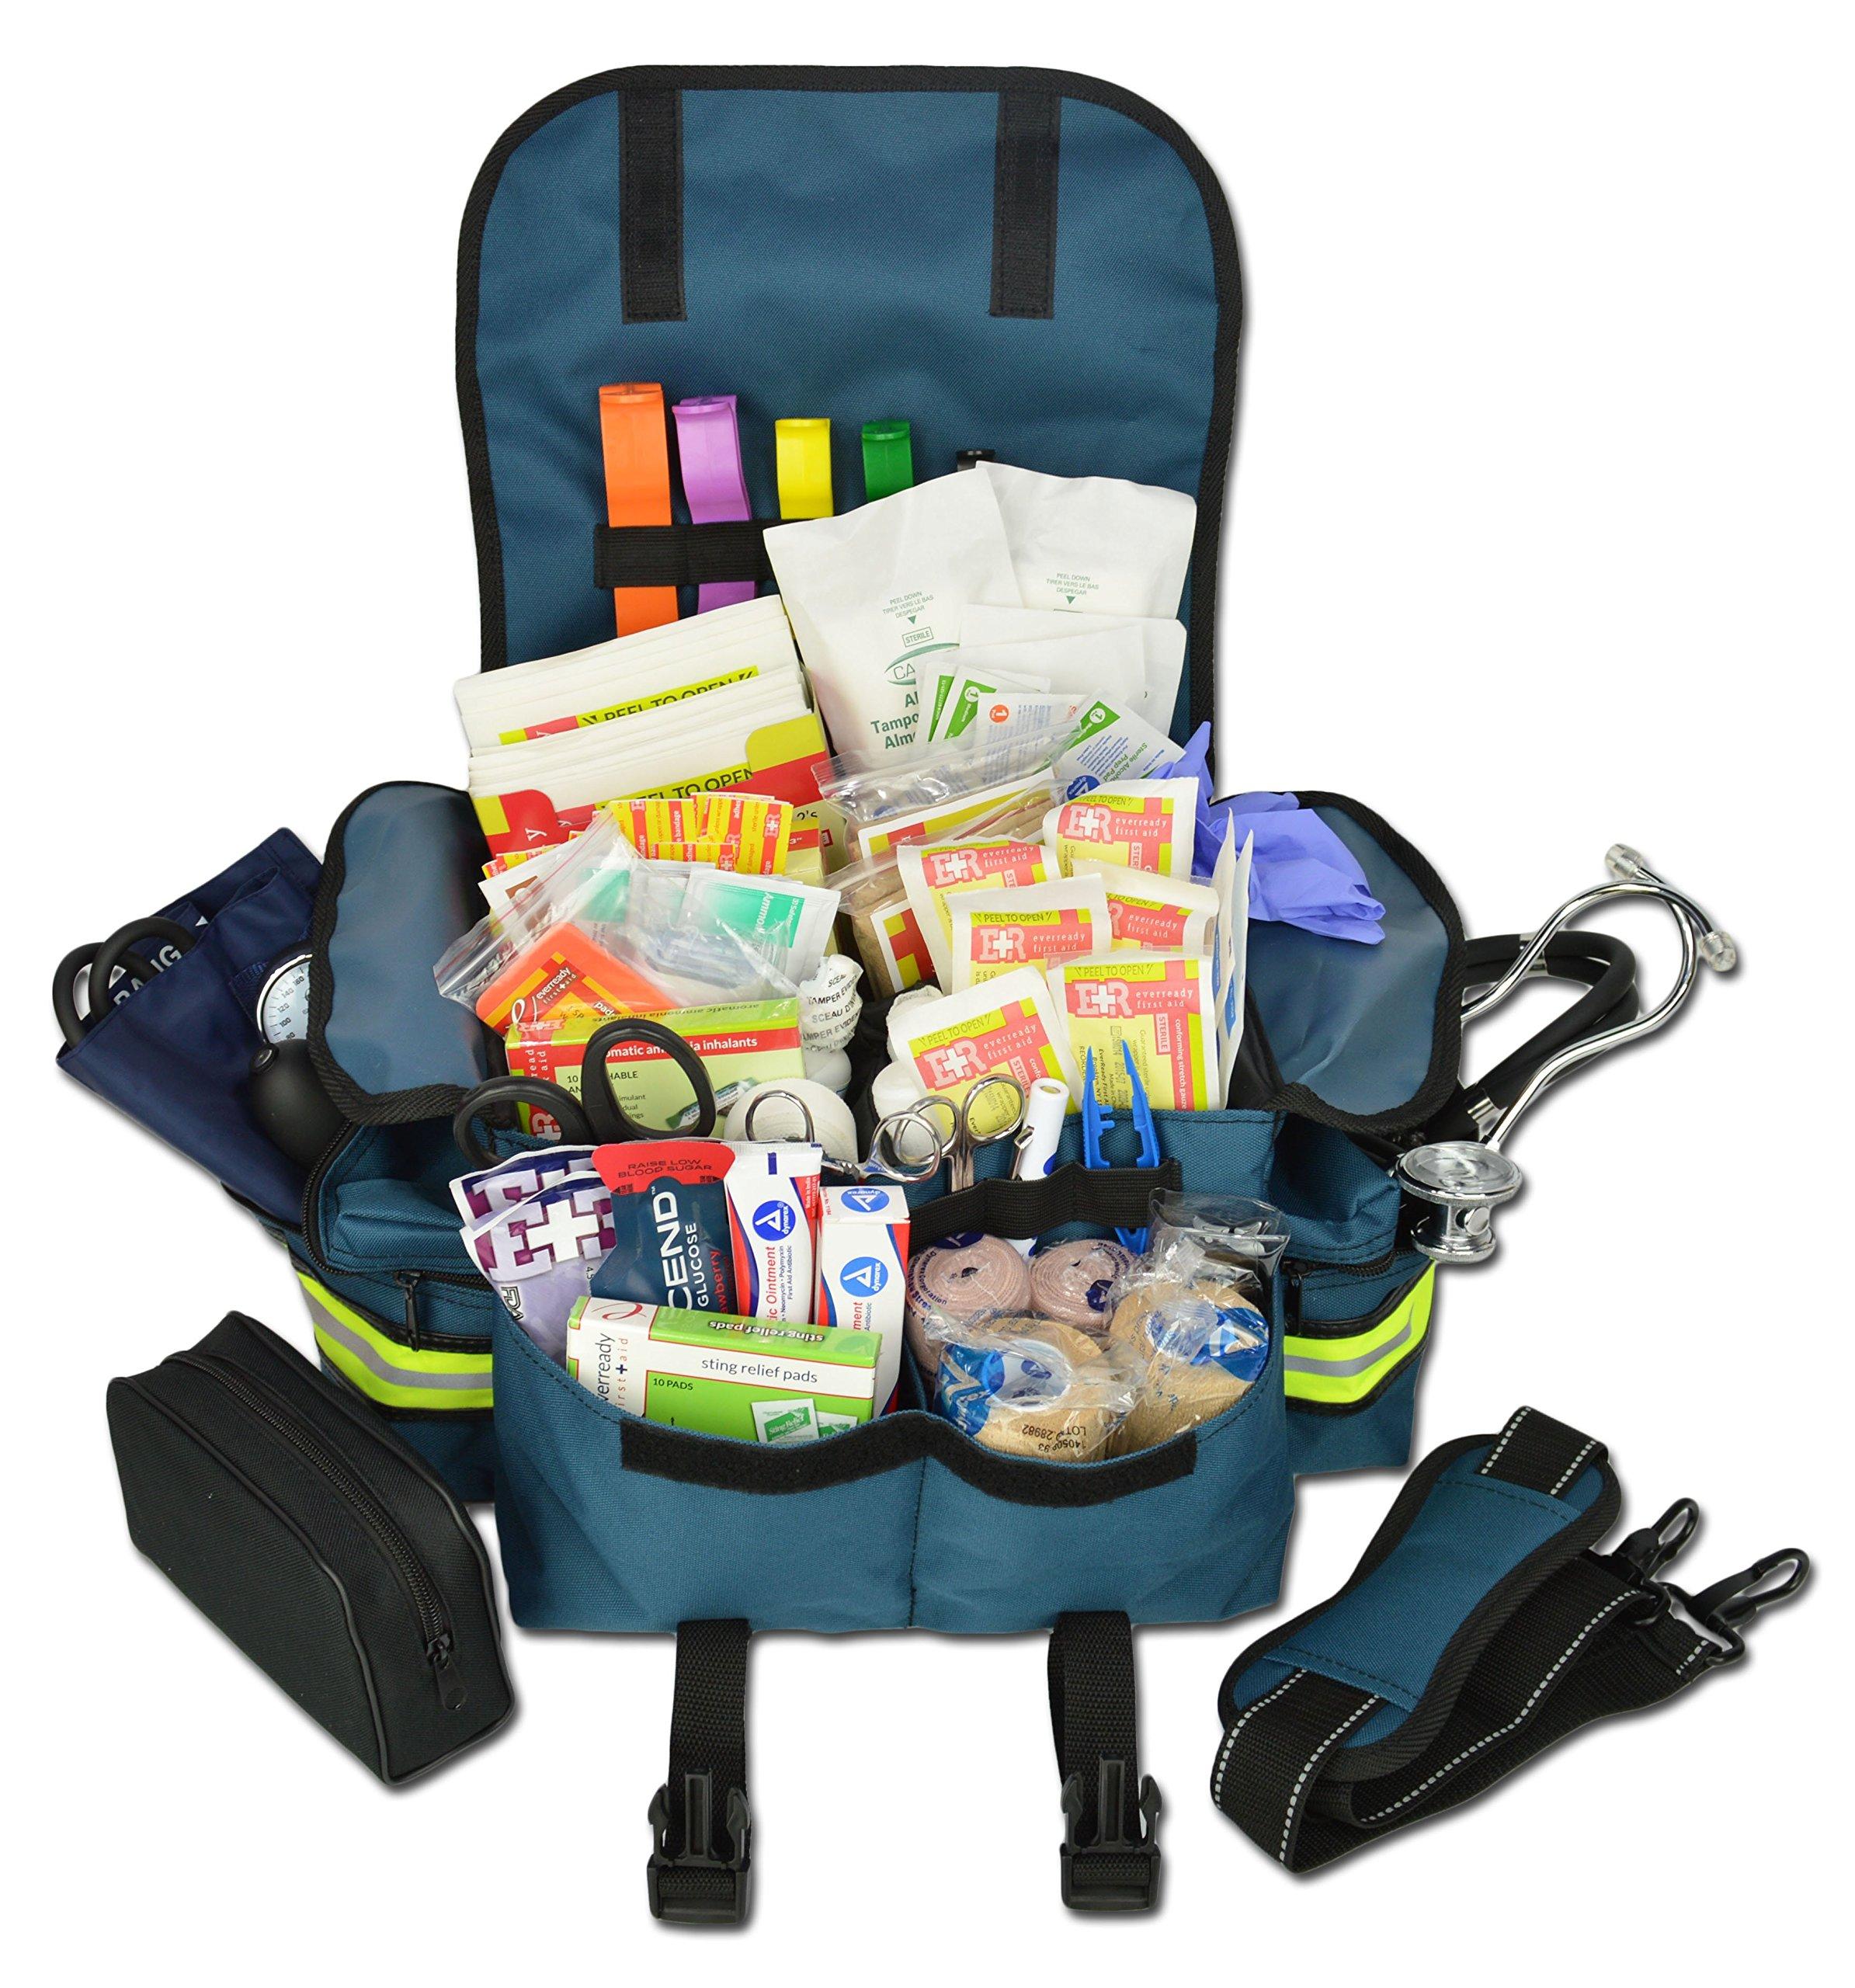 Lightning X Small First Responder EMT EMS Trauma Bag Stocked First Aid Fill Kit B (Navy Blue)